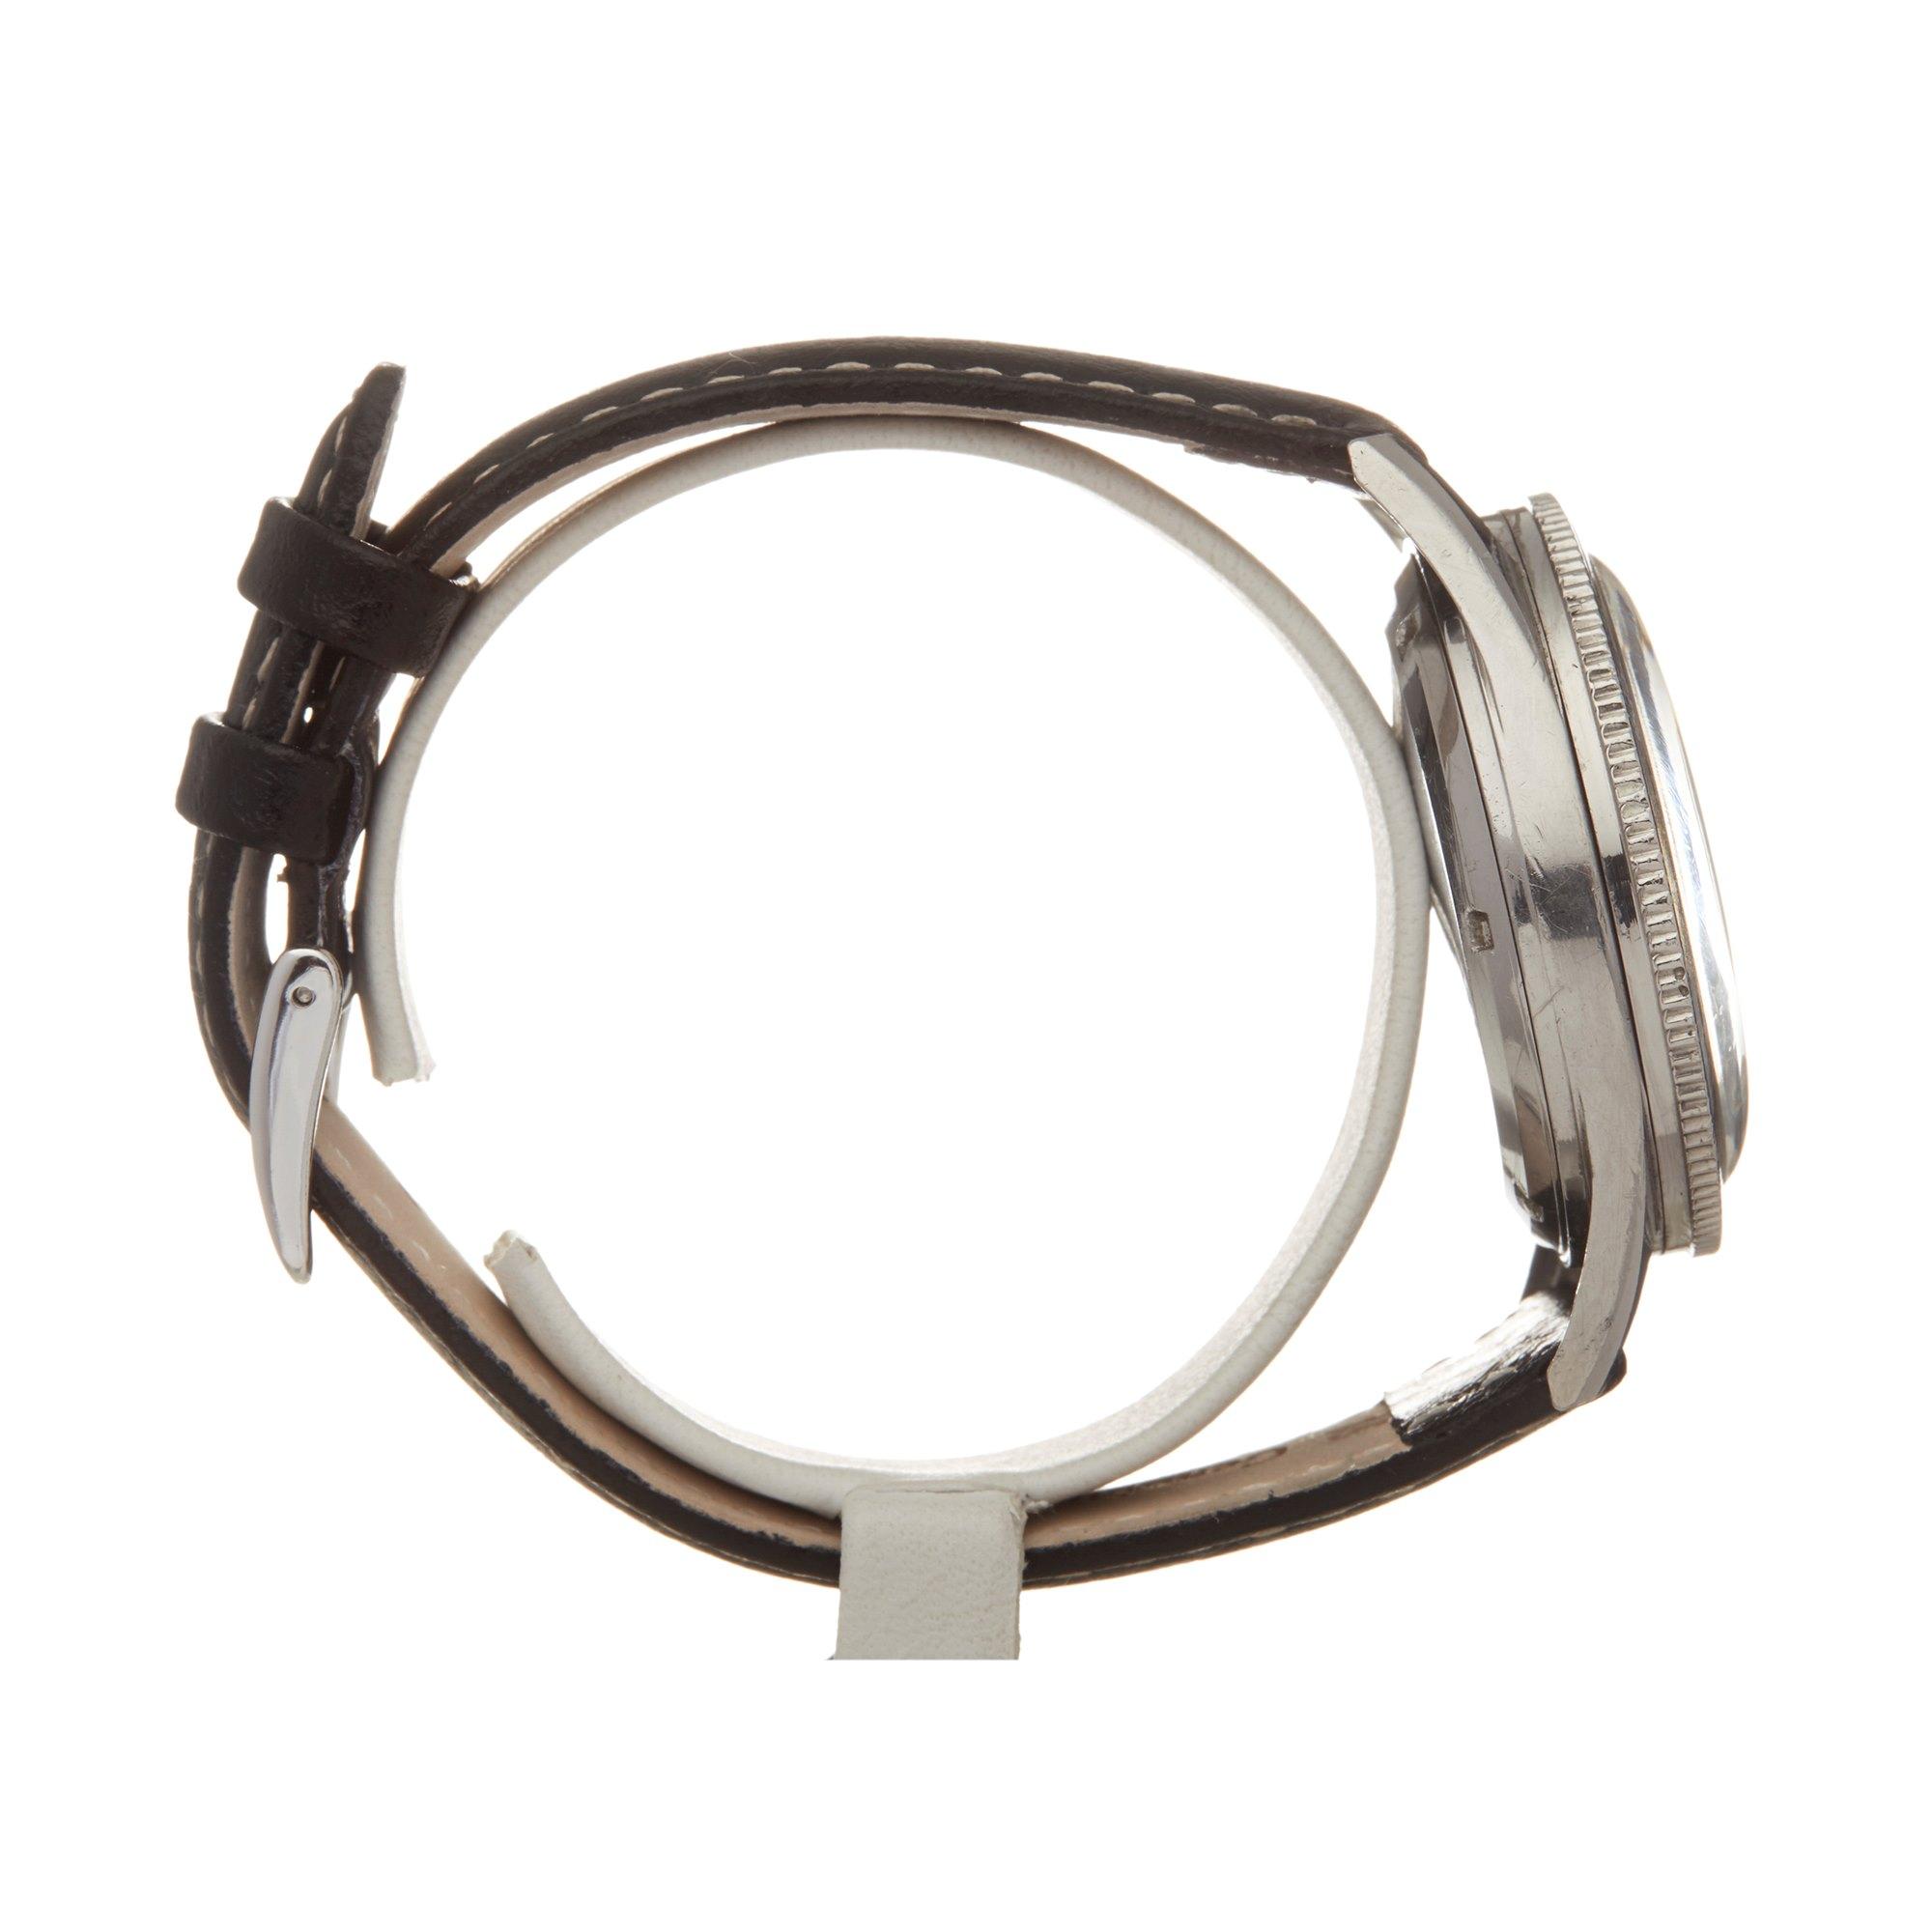 Heuer Autavia Andretti Chronograph Stainless Steel 3646